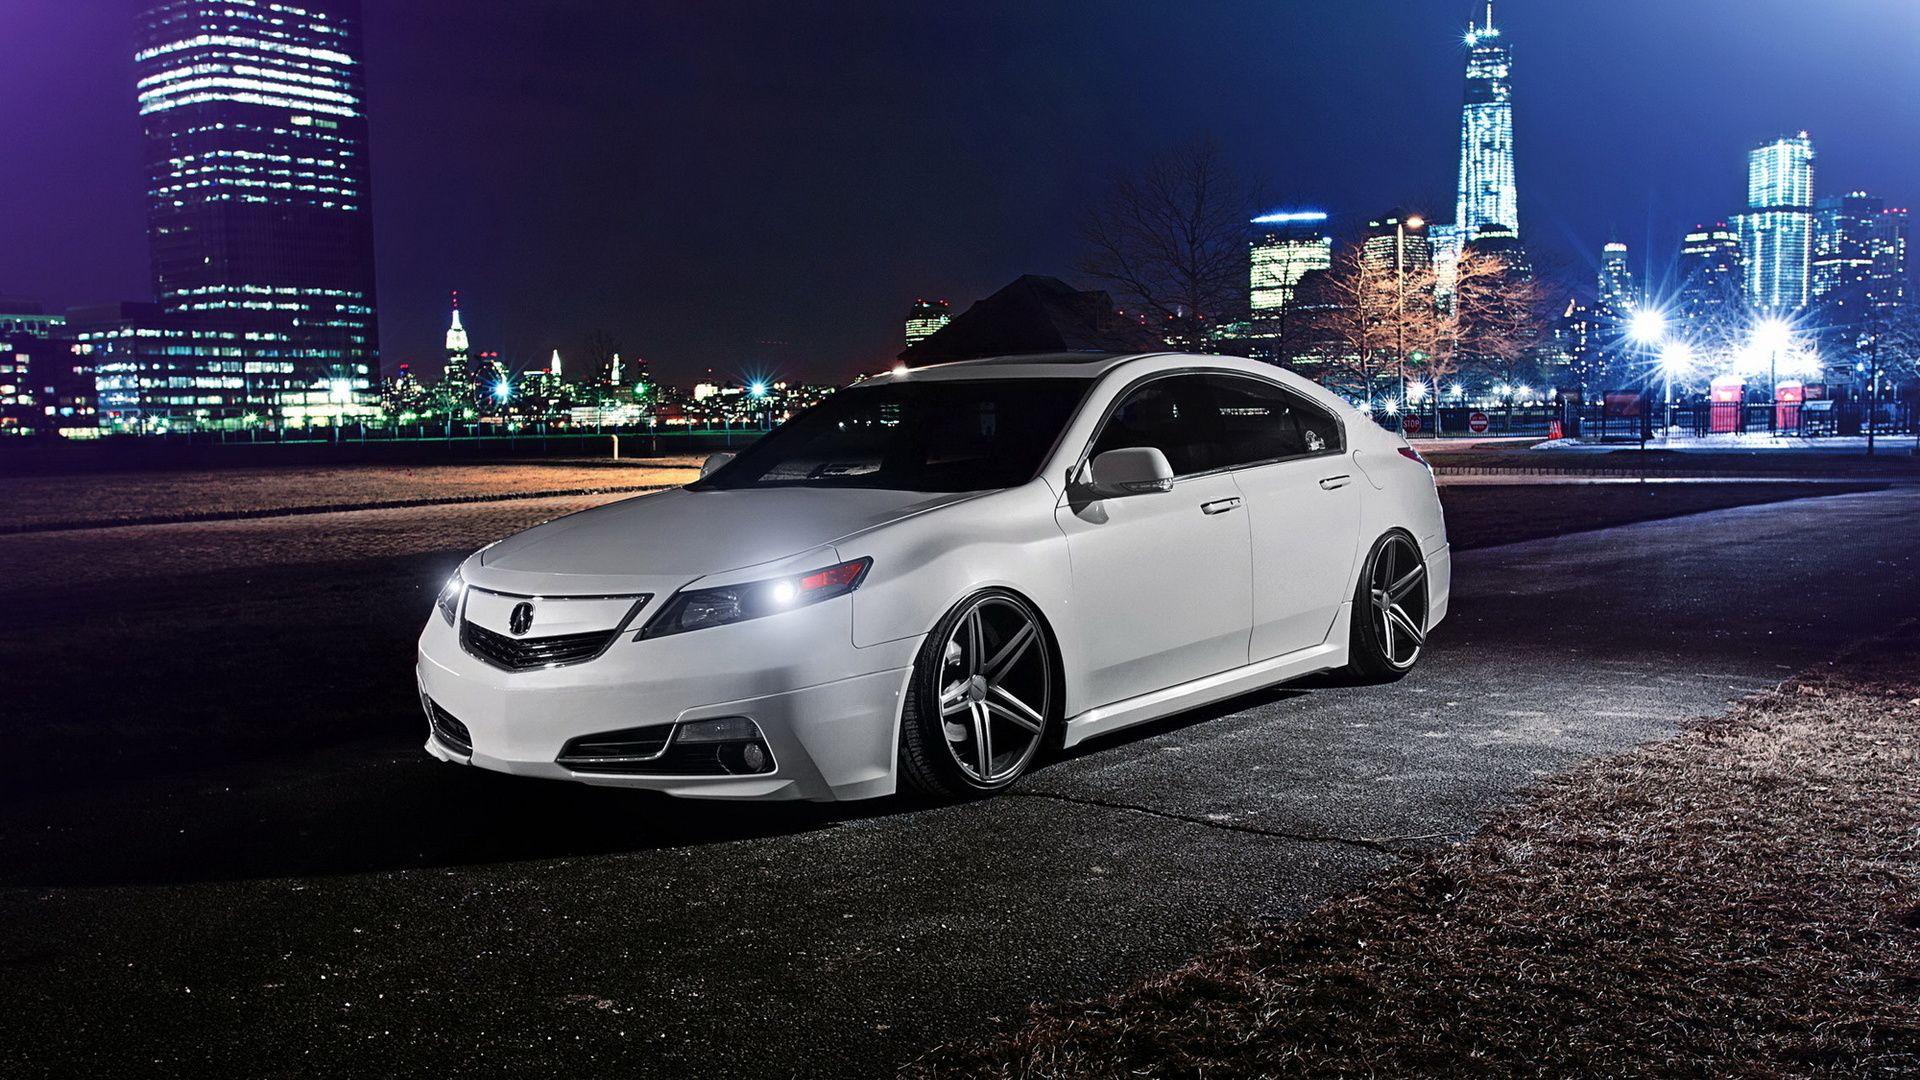 Honda Accord good background